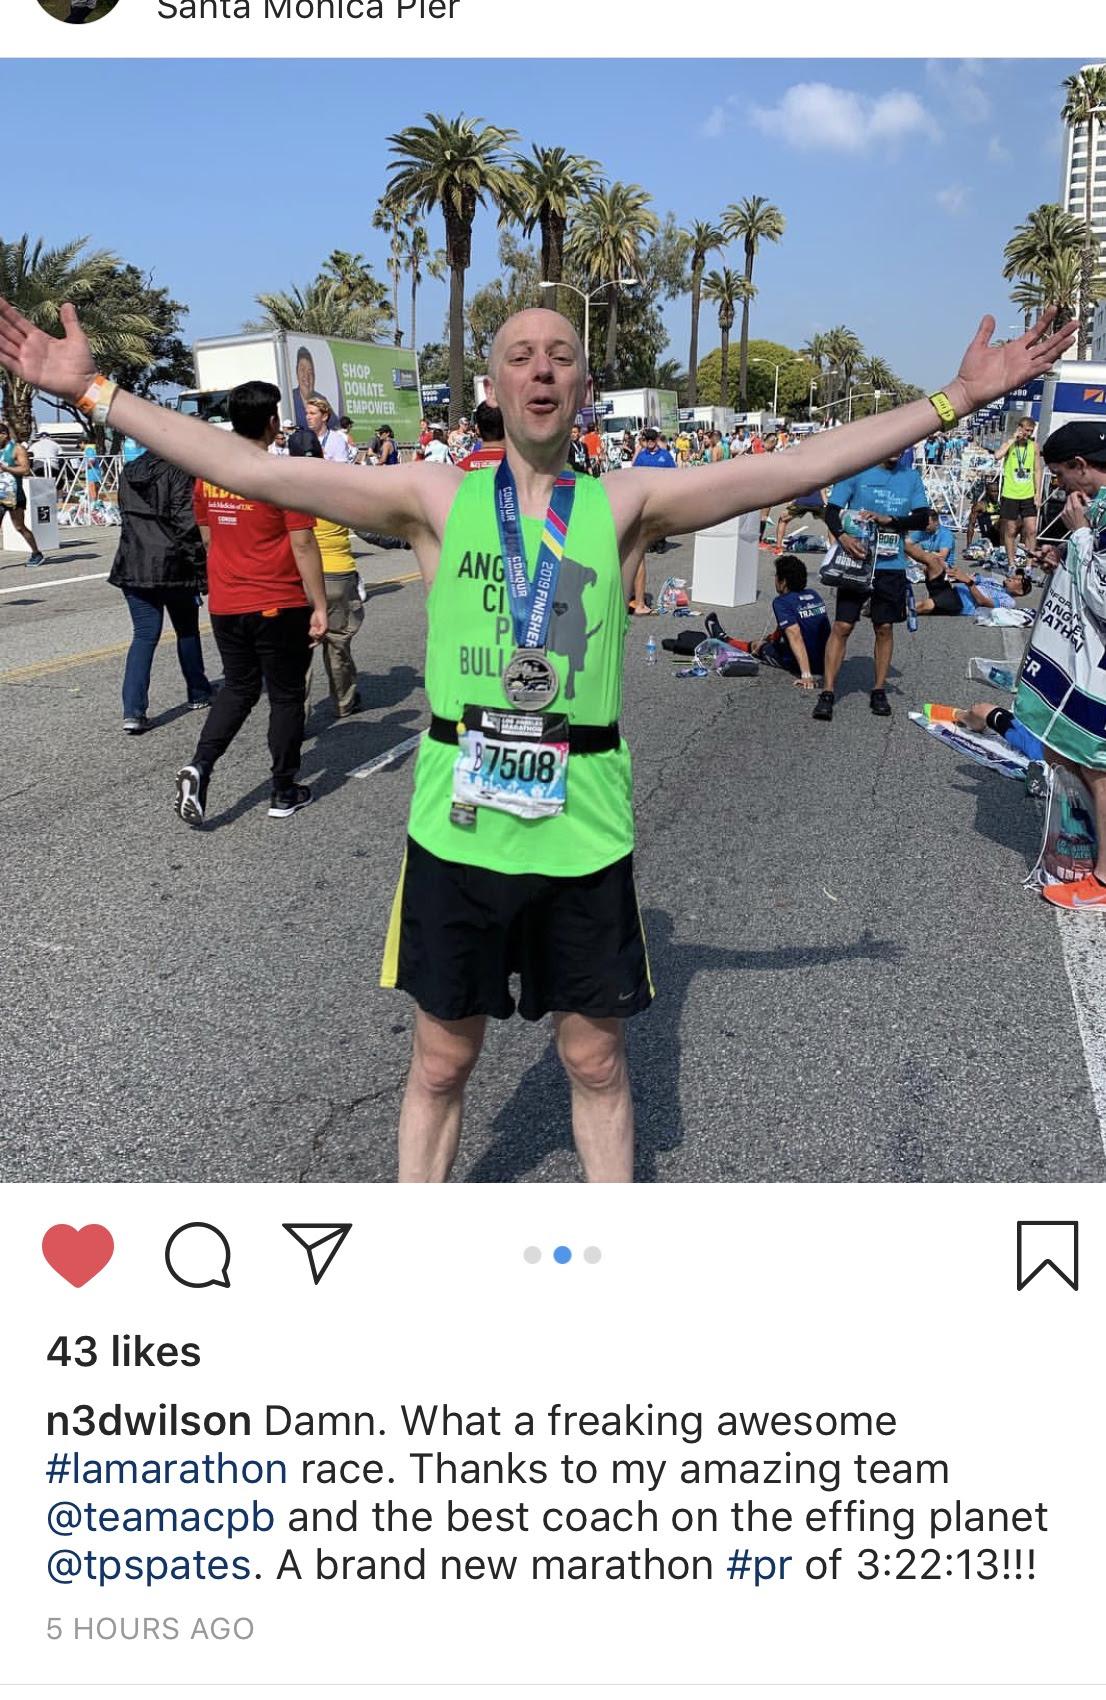 Ned Wilson, moments after smashing his marathon PR at the LA marathon last Sunday.